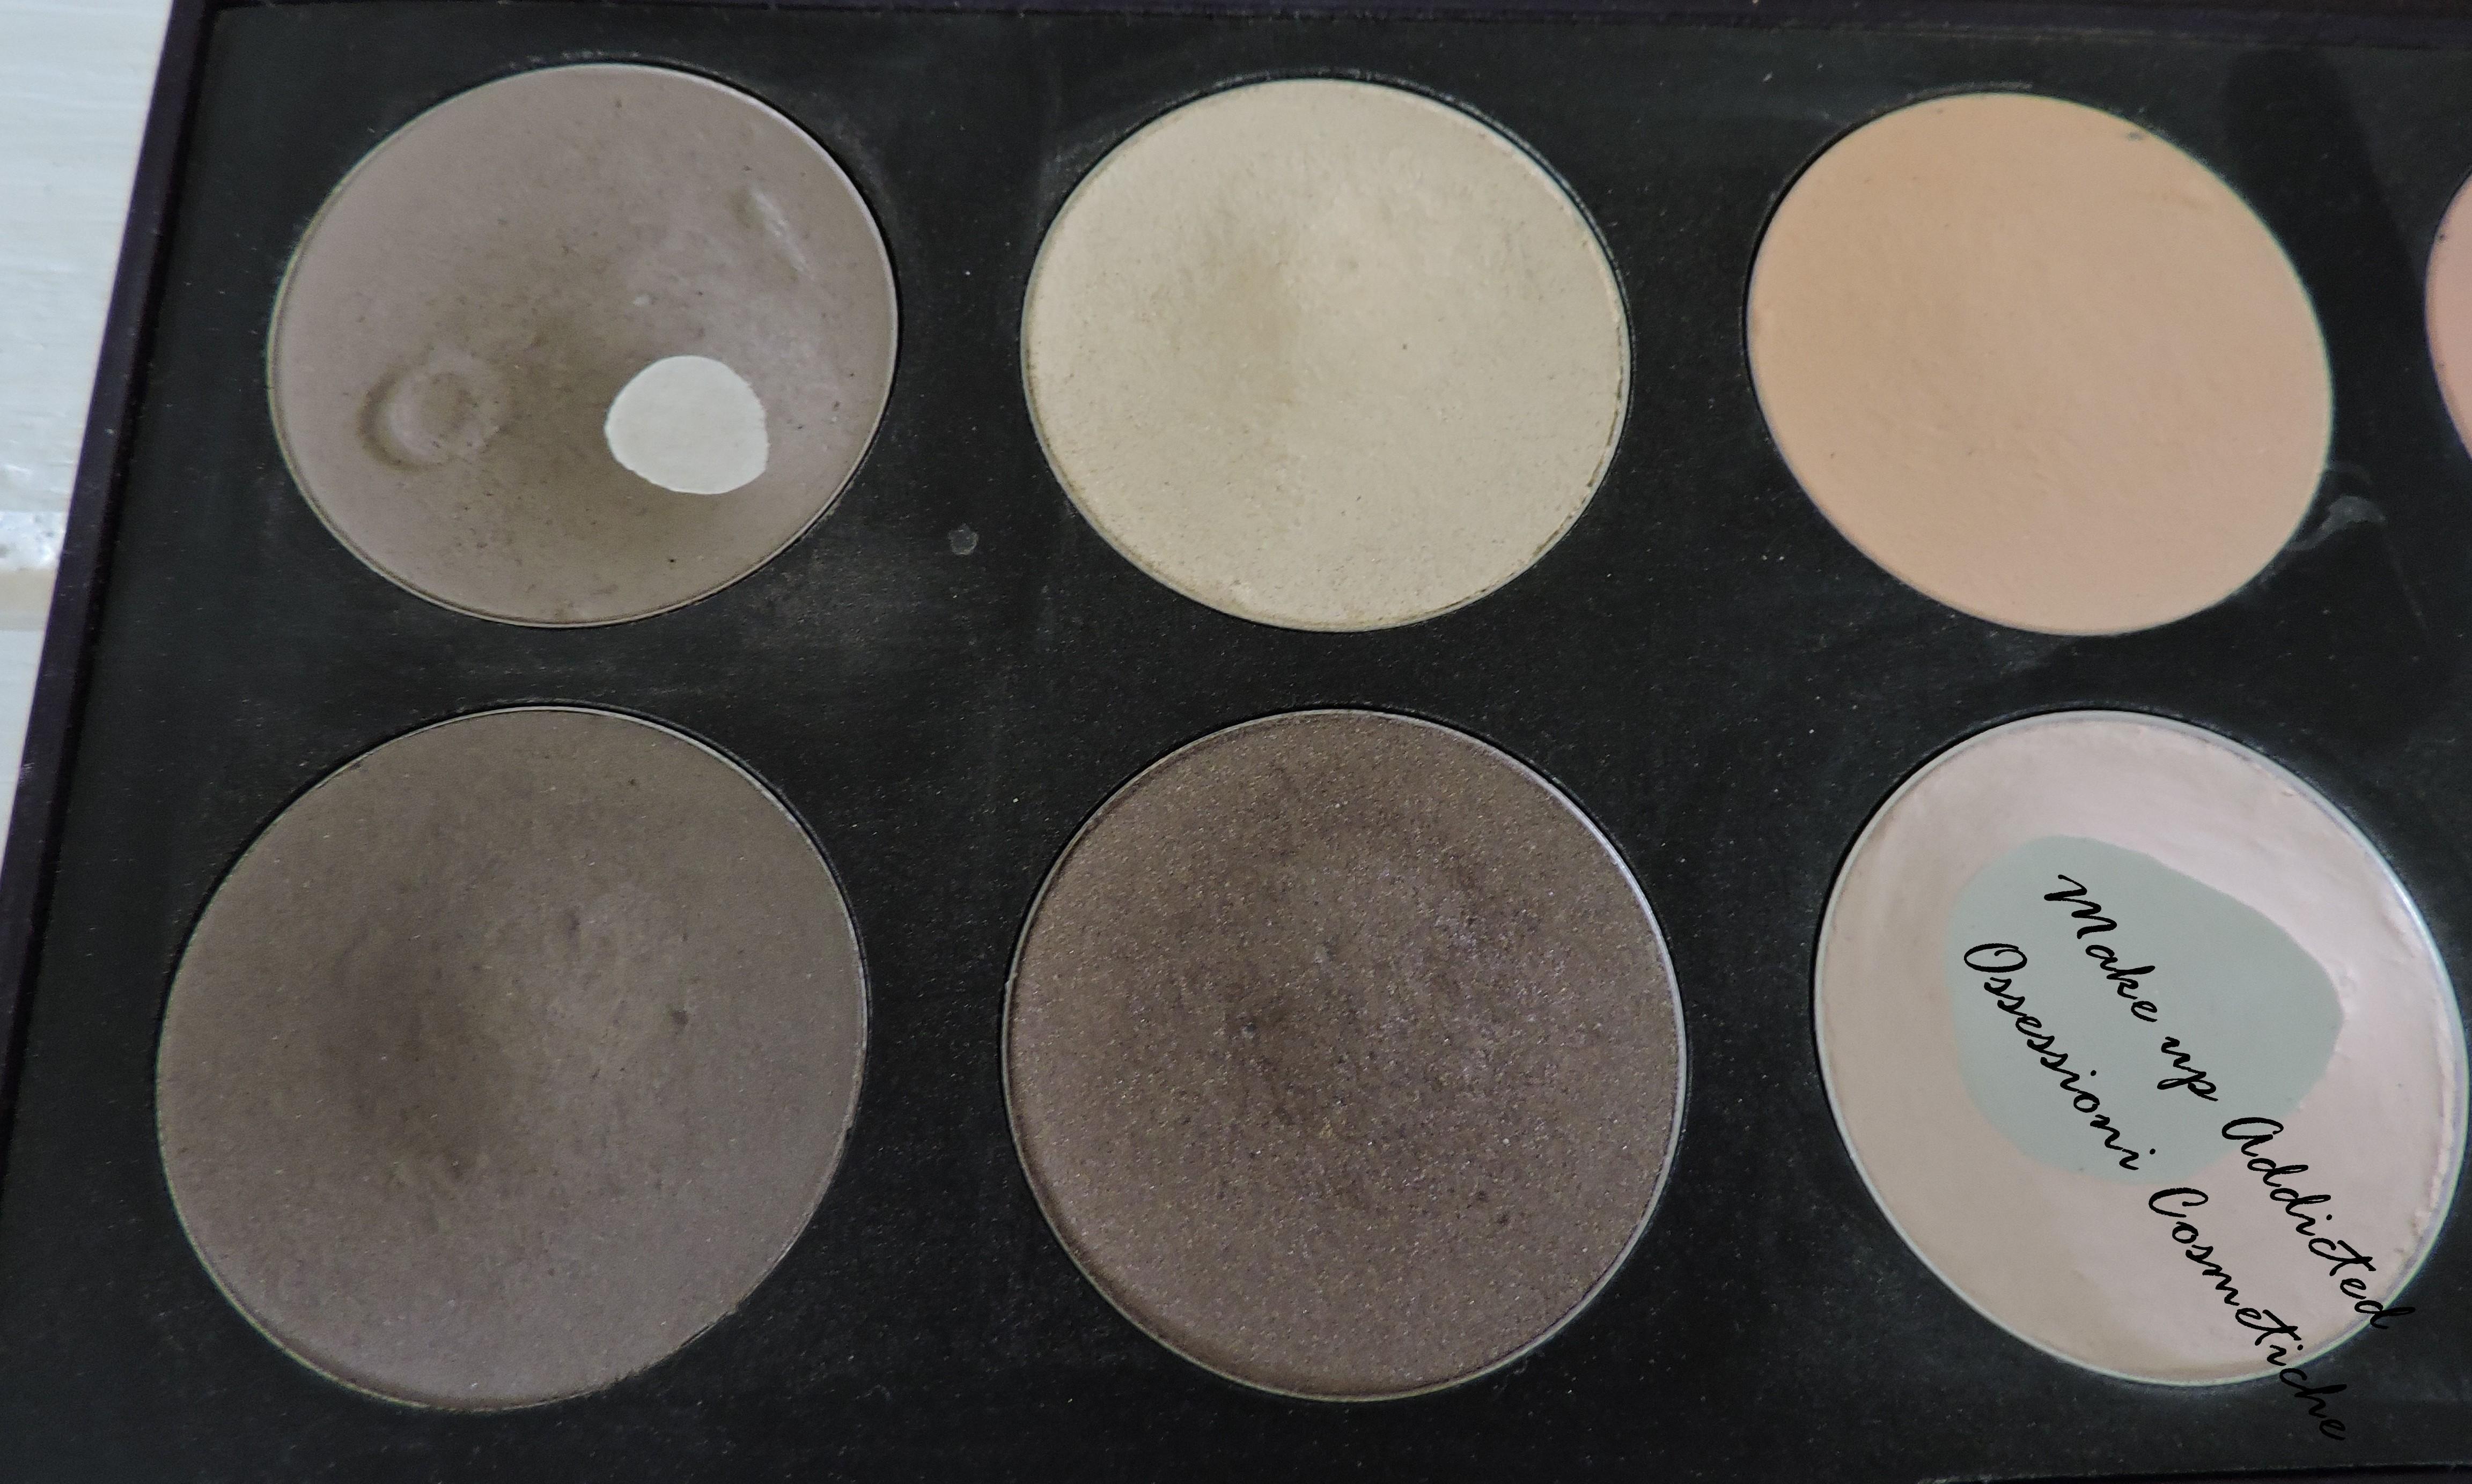 palette neve cosmetics